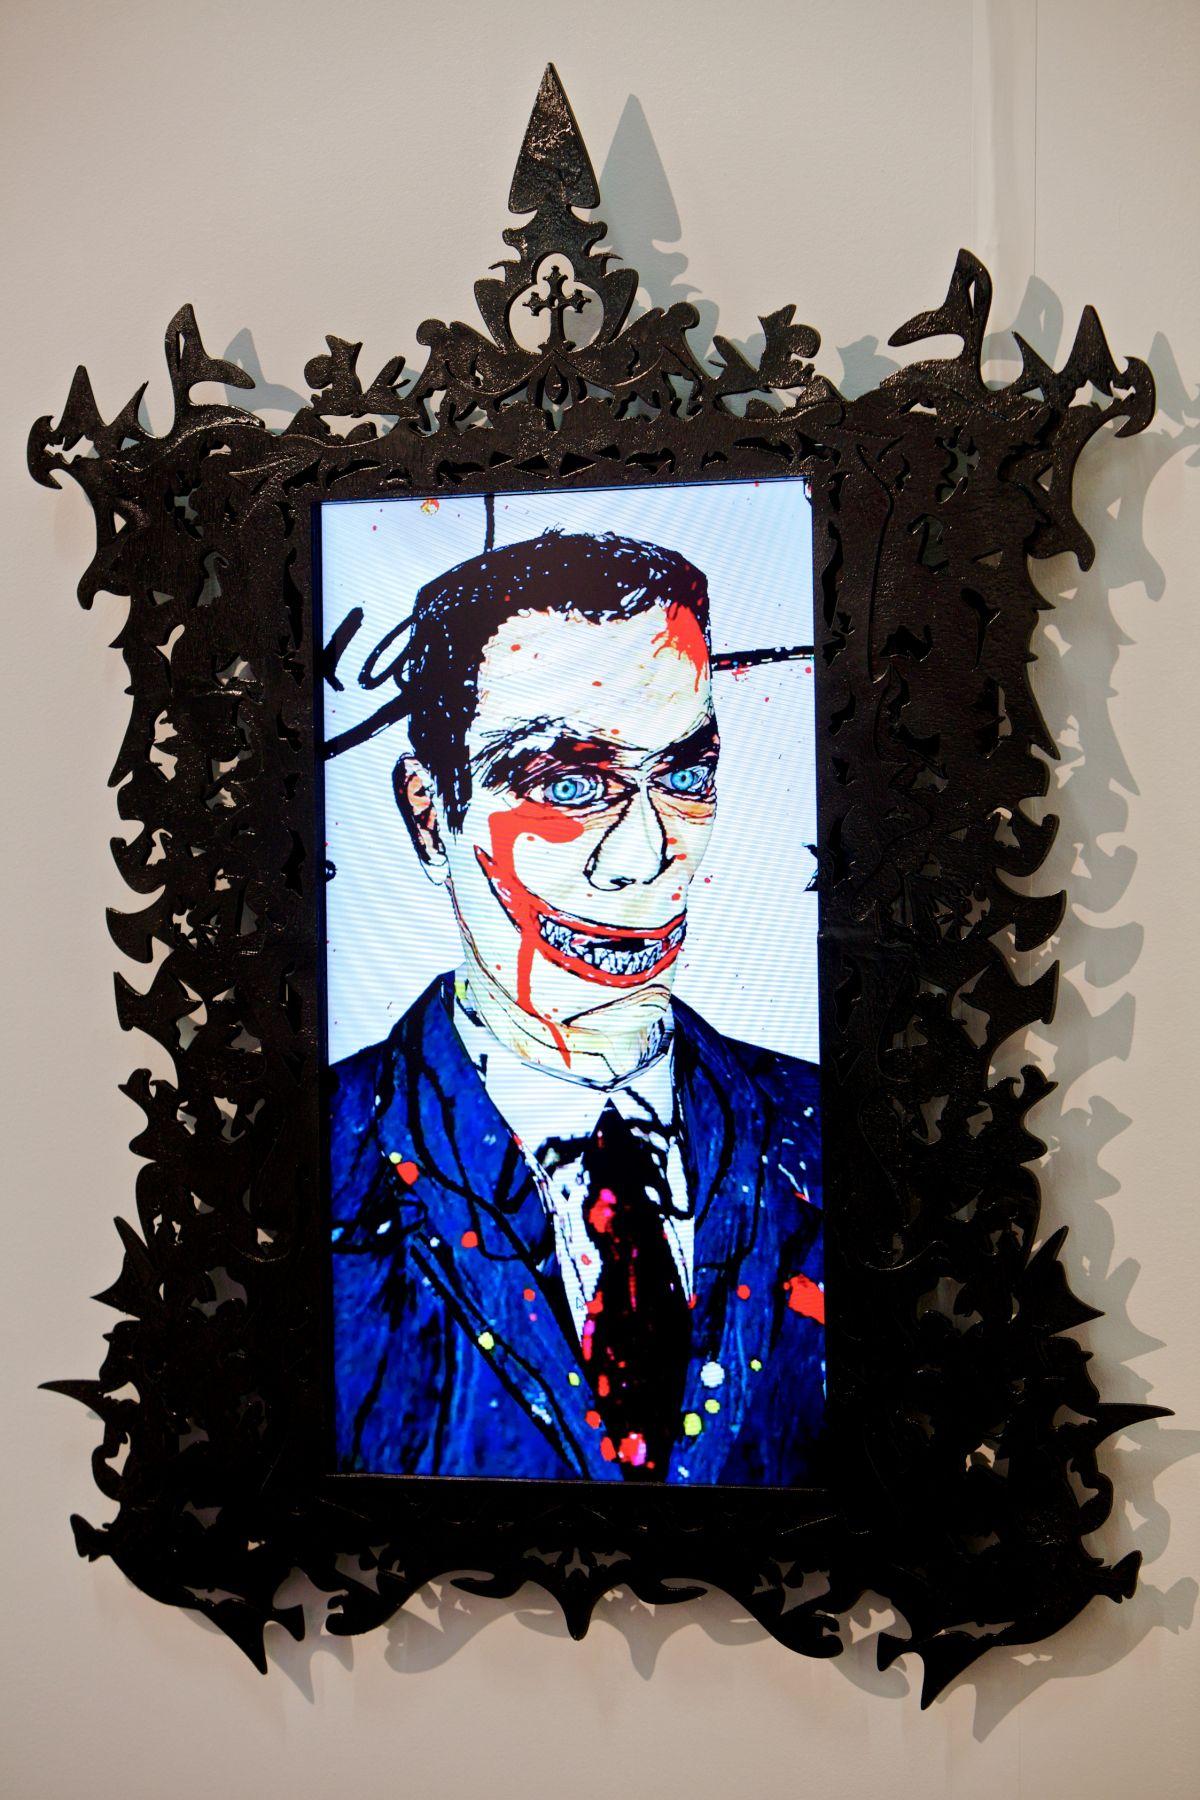 FEDERICO SOLMI_Dick Richman, Portrait of a Scam Artist_Art Brussels 29